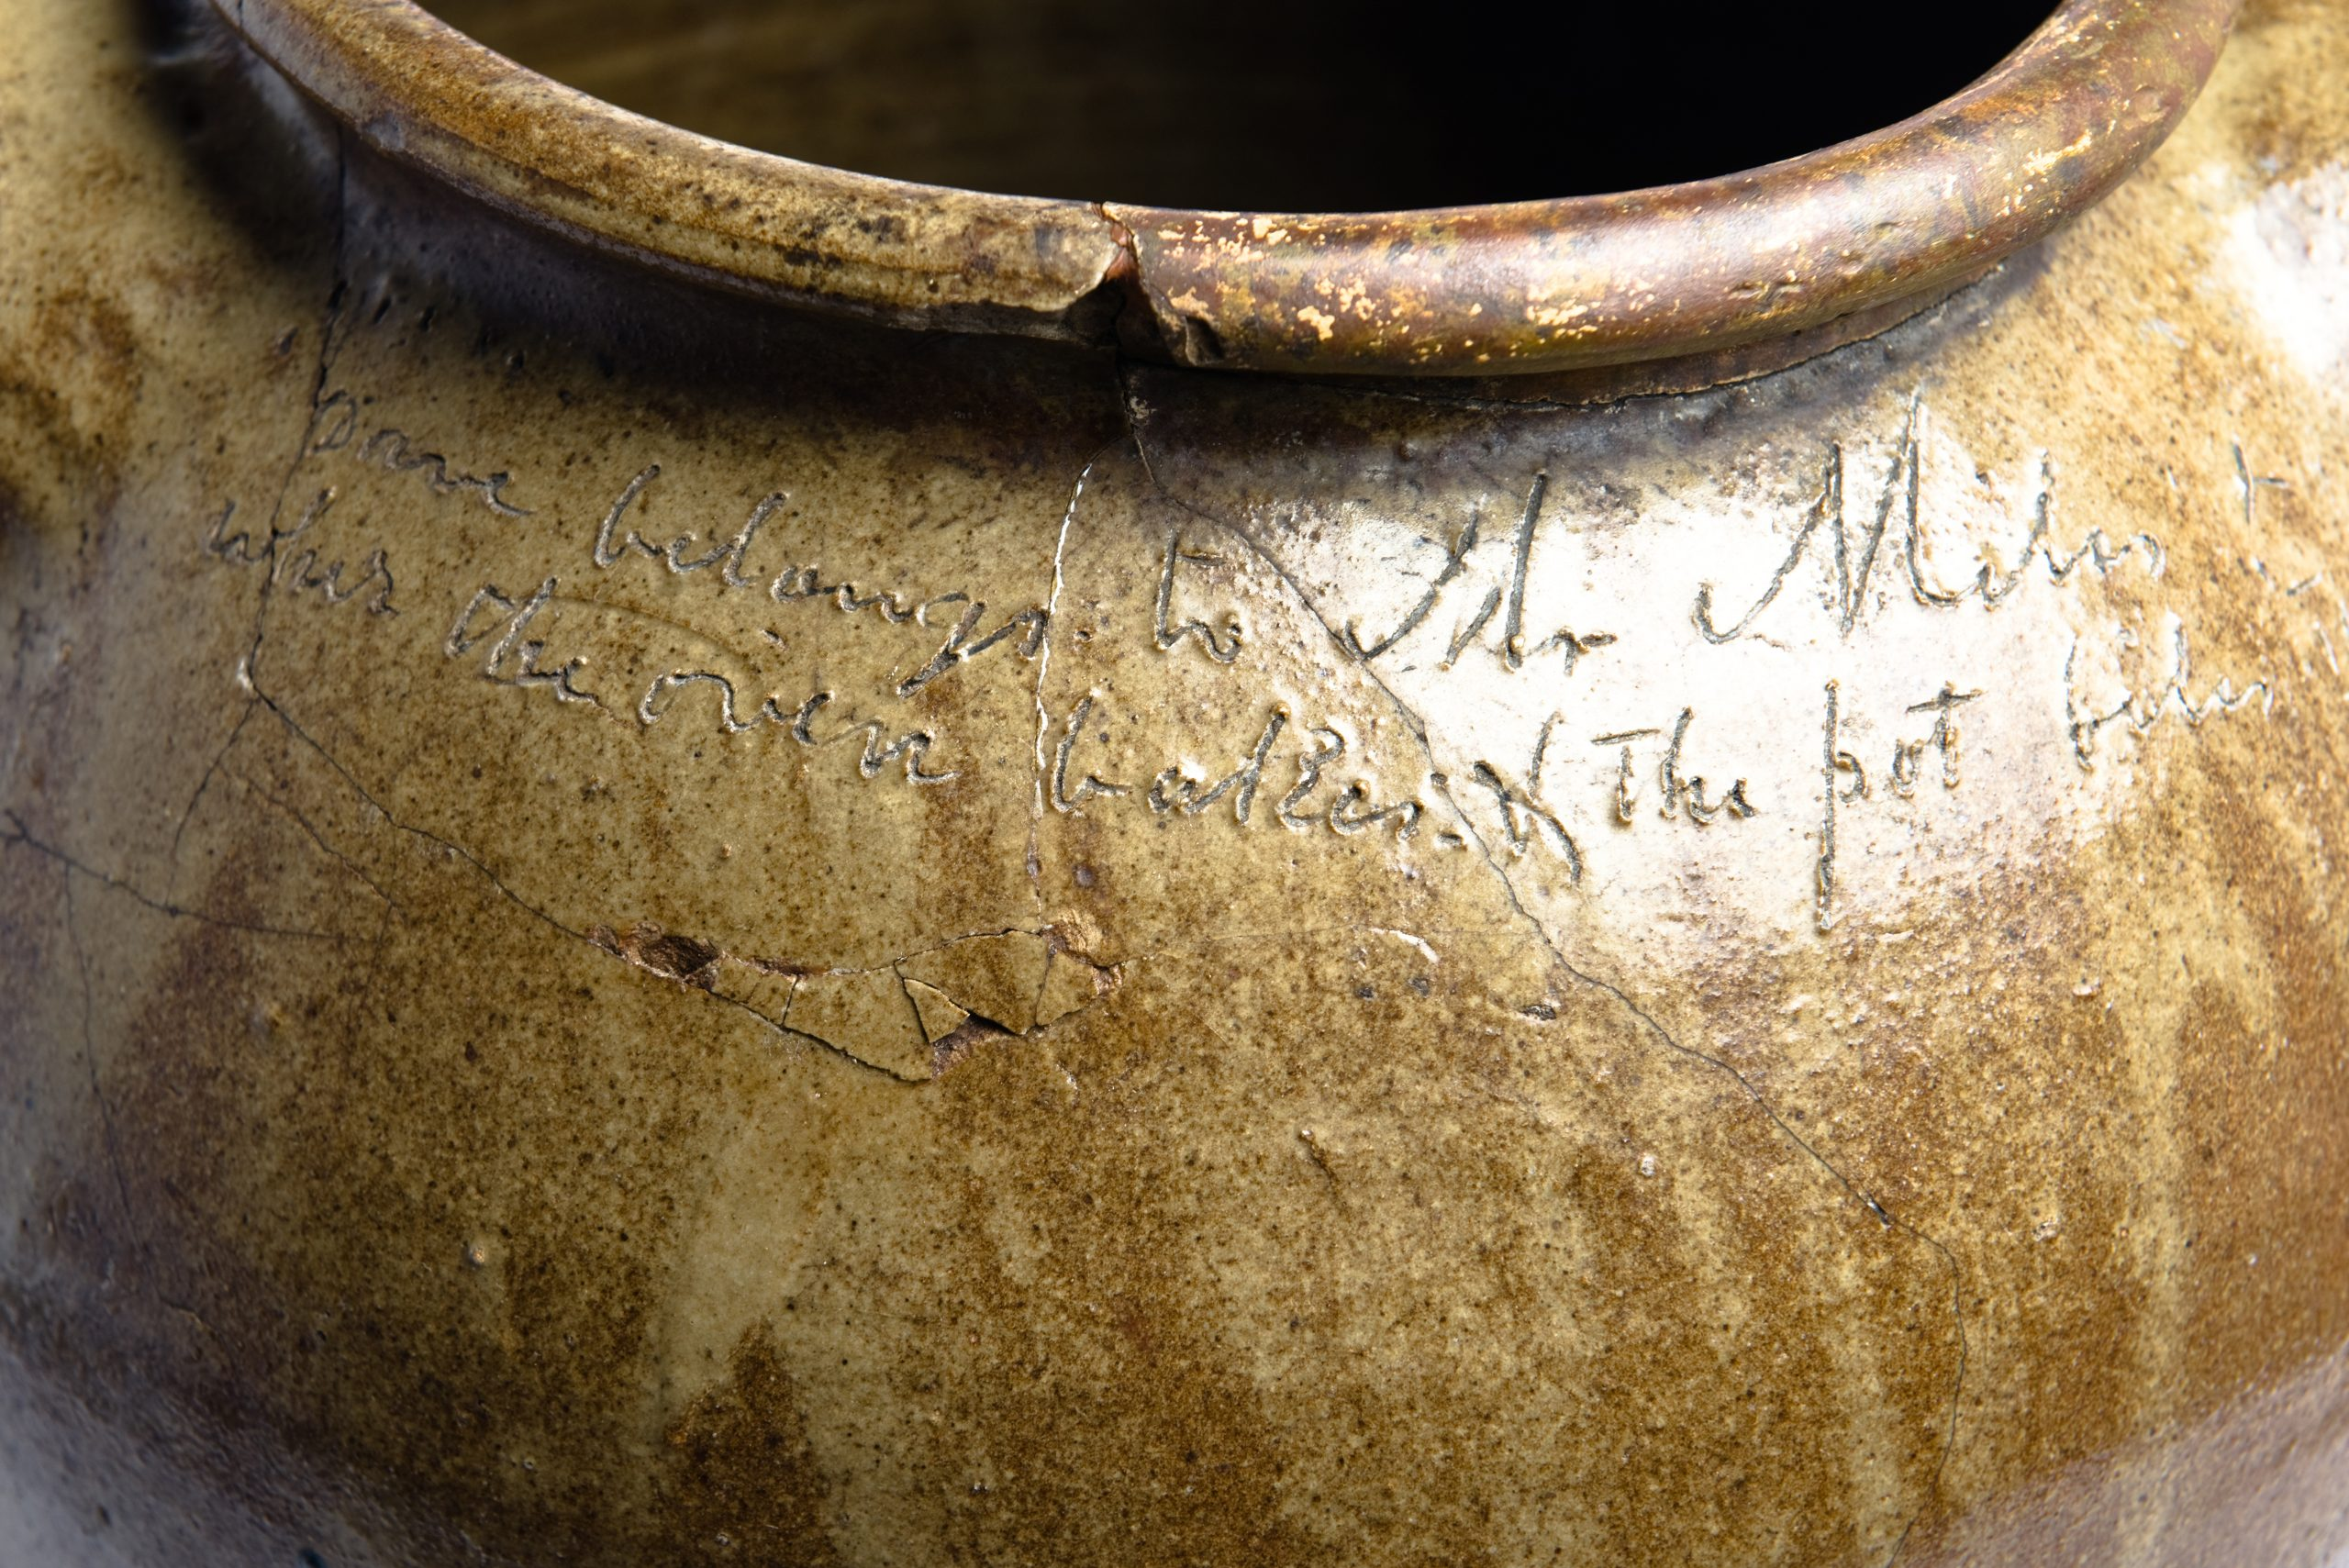 writing on pot